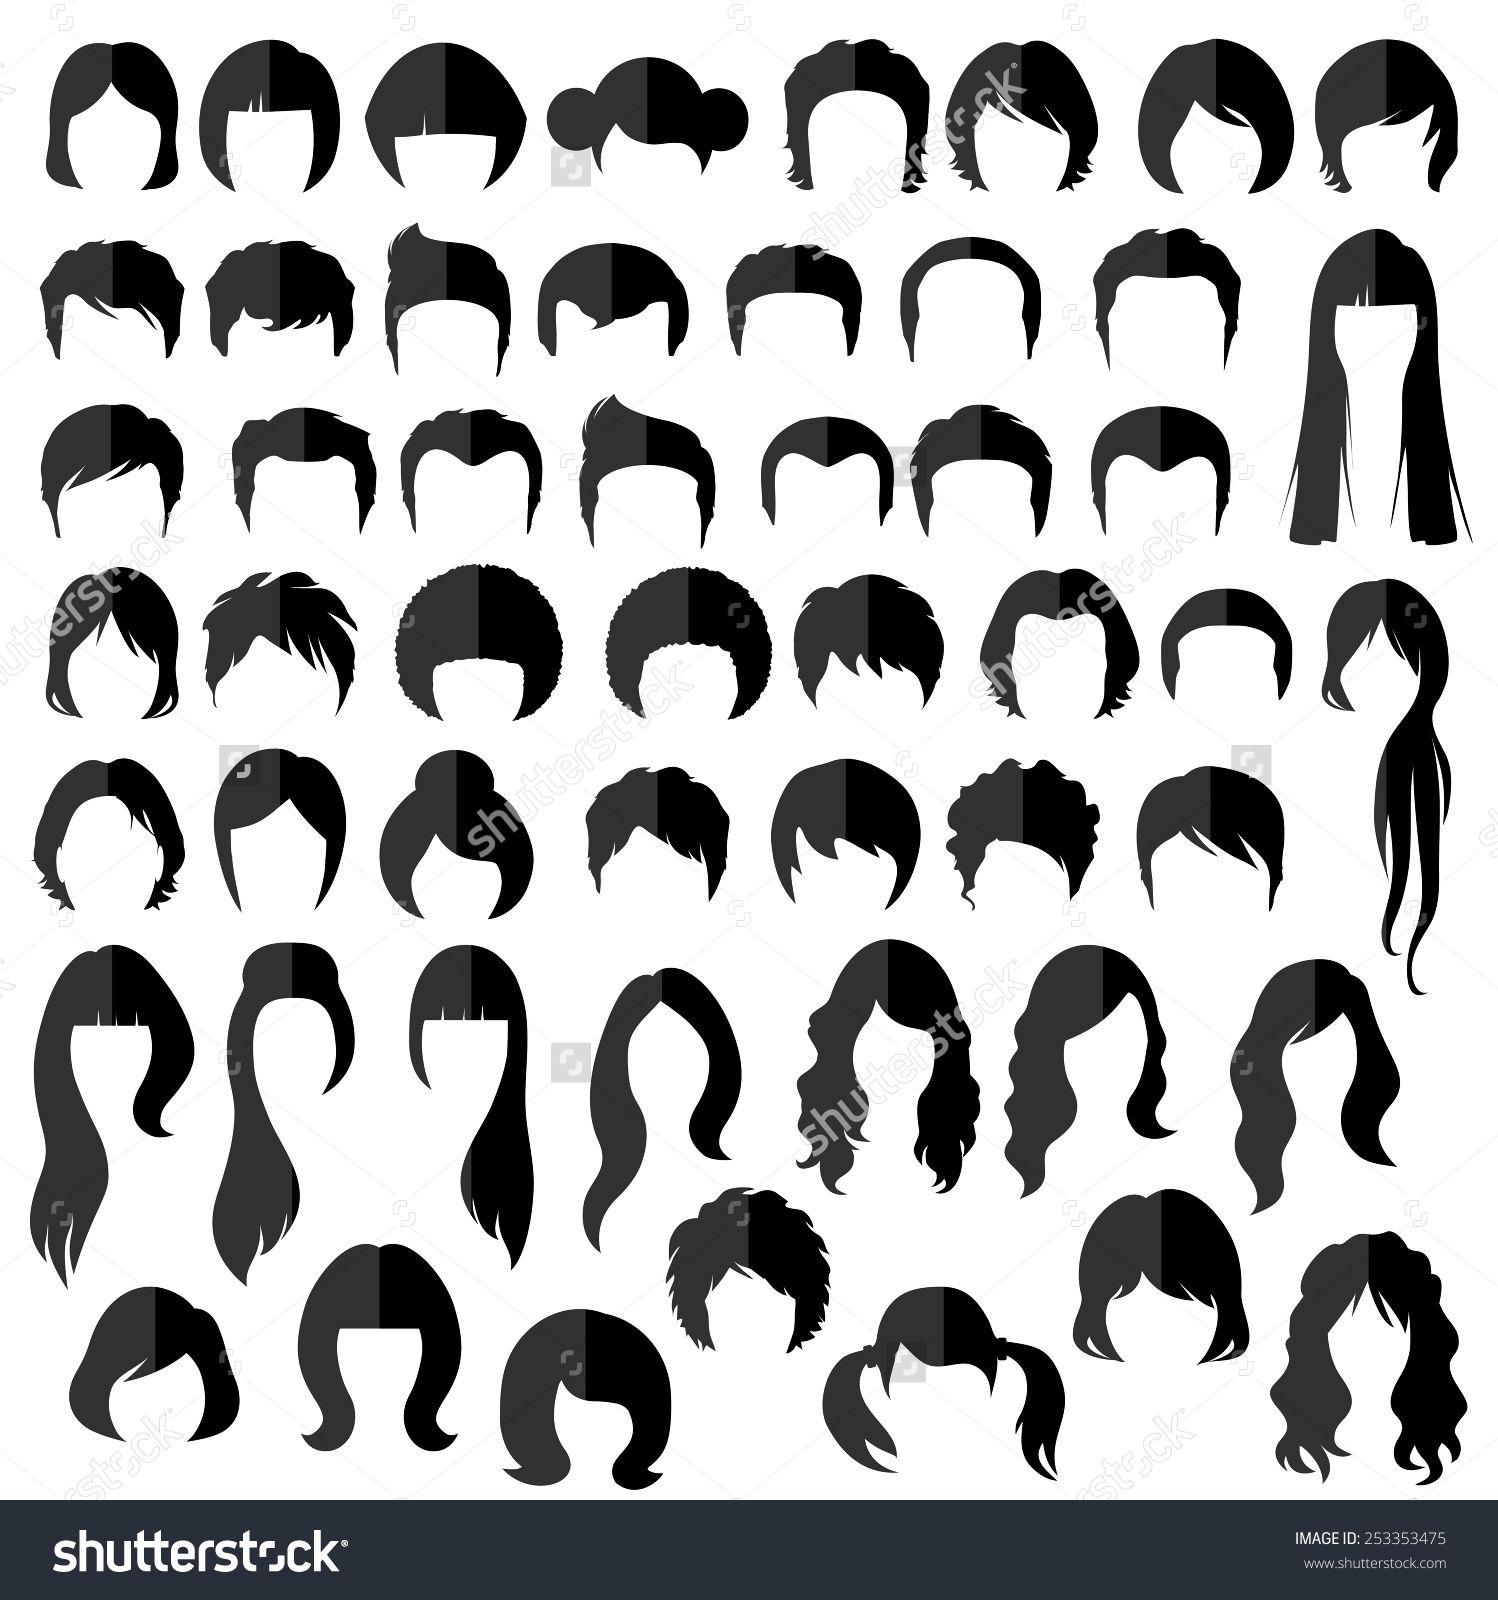 Stockvectorwomanmanhairvectorhairstylesilhouette - Girl hairstyle vector free download